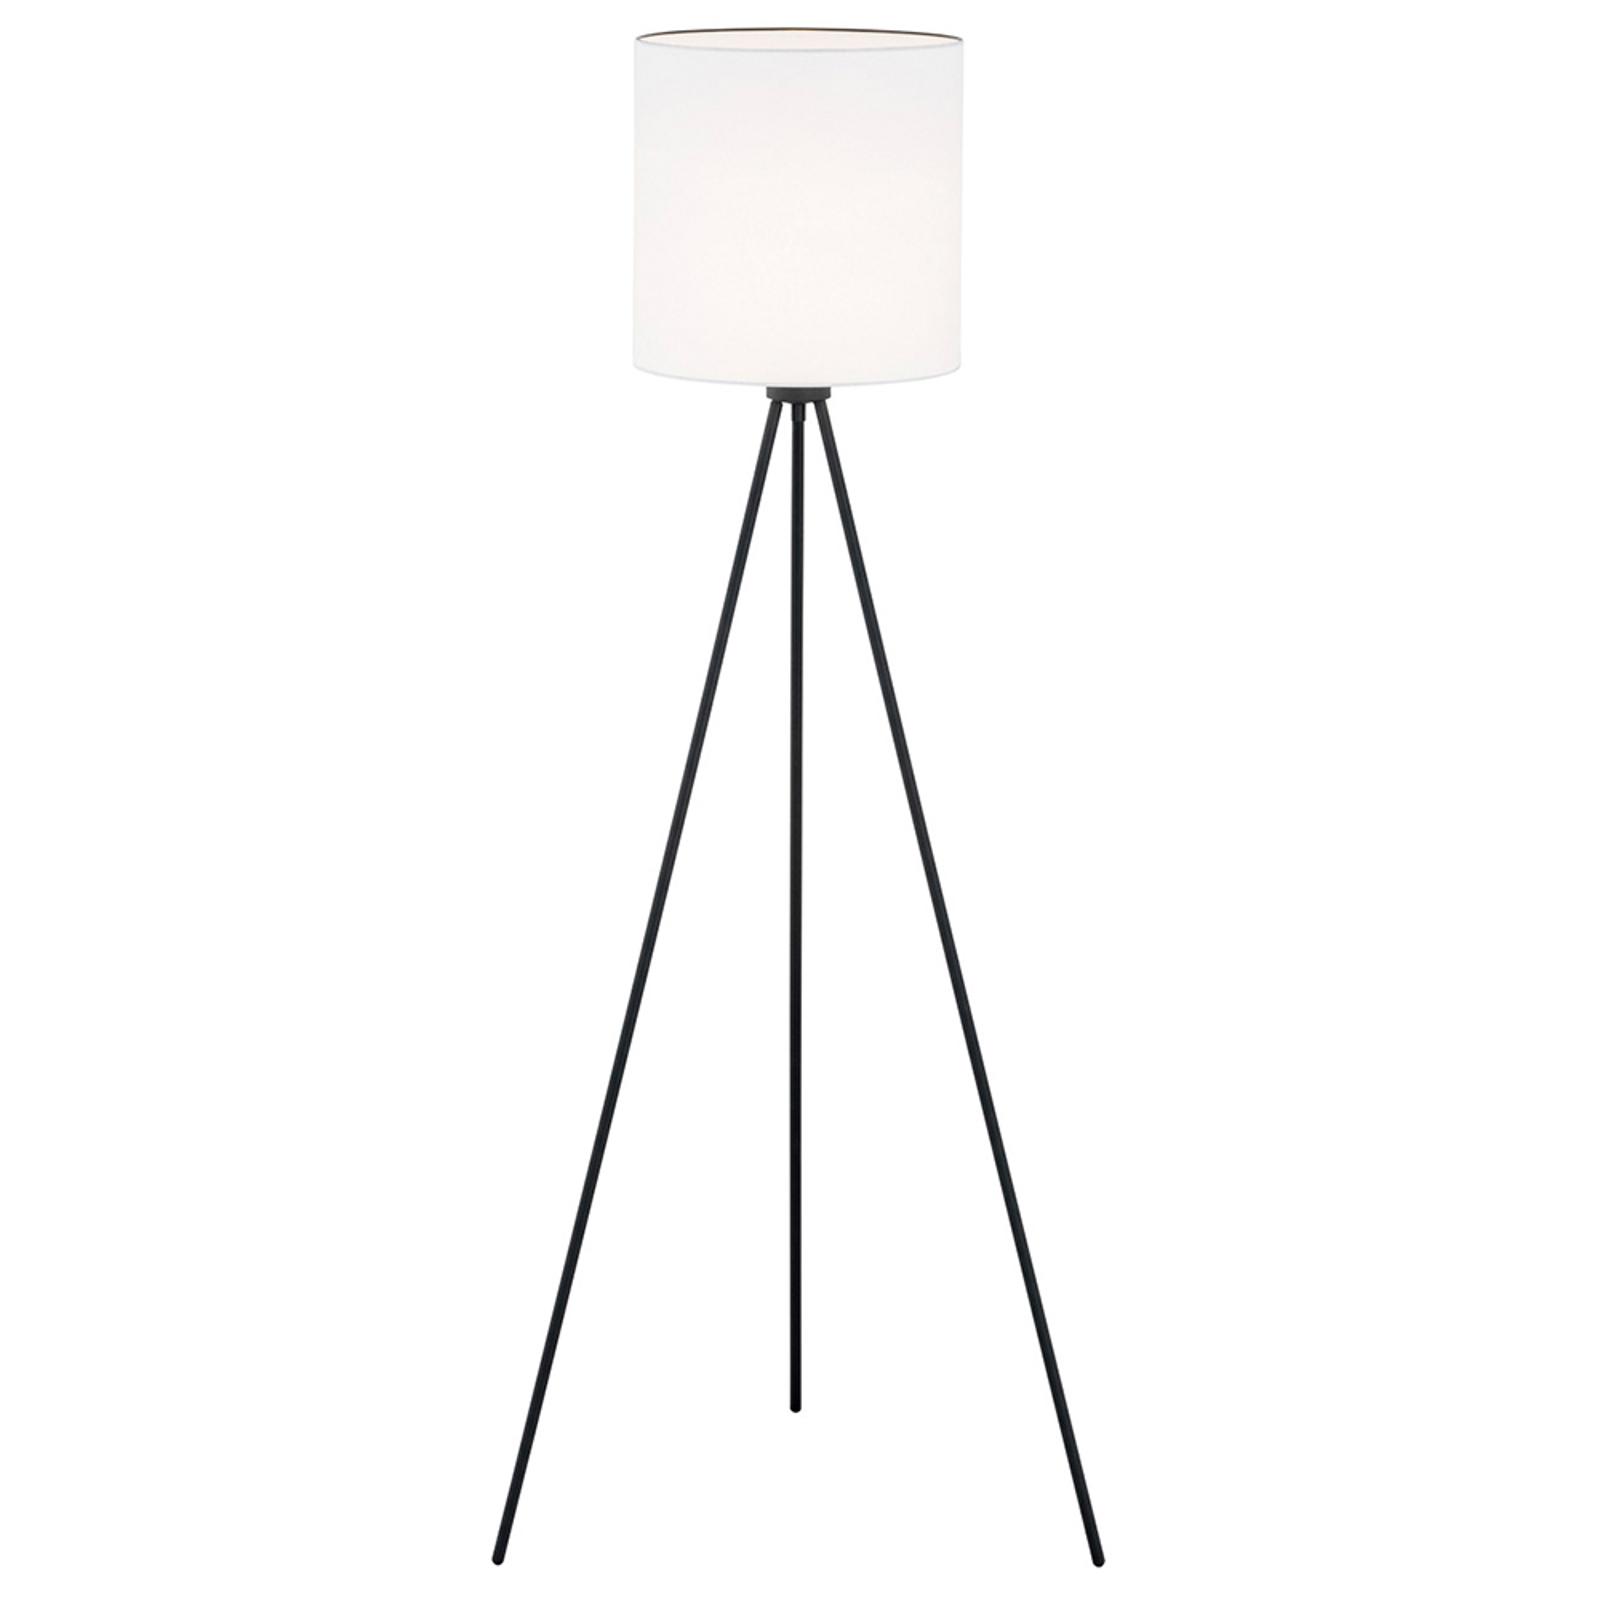 Tekstil-gulvlampe Harris, trebein svart/hvit